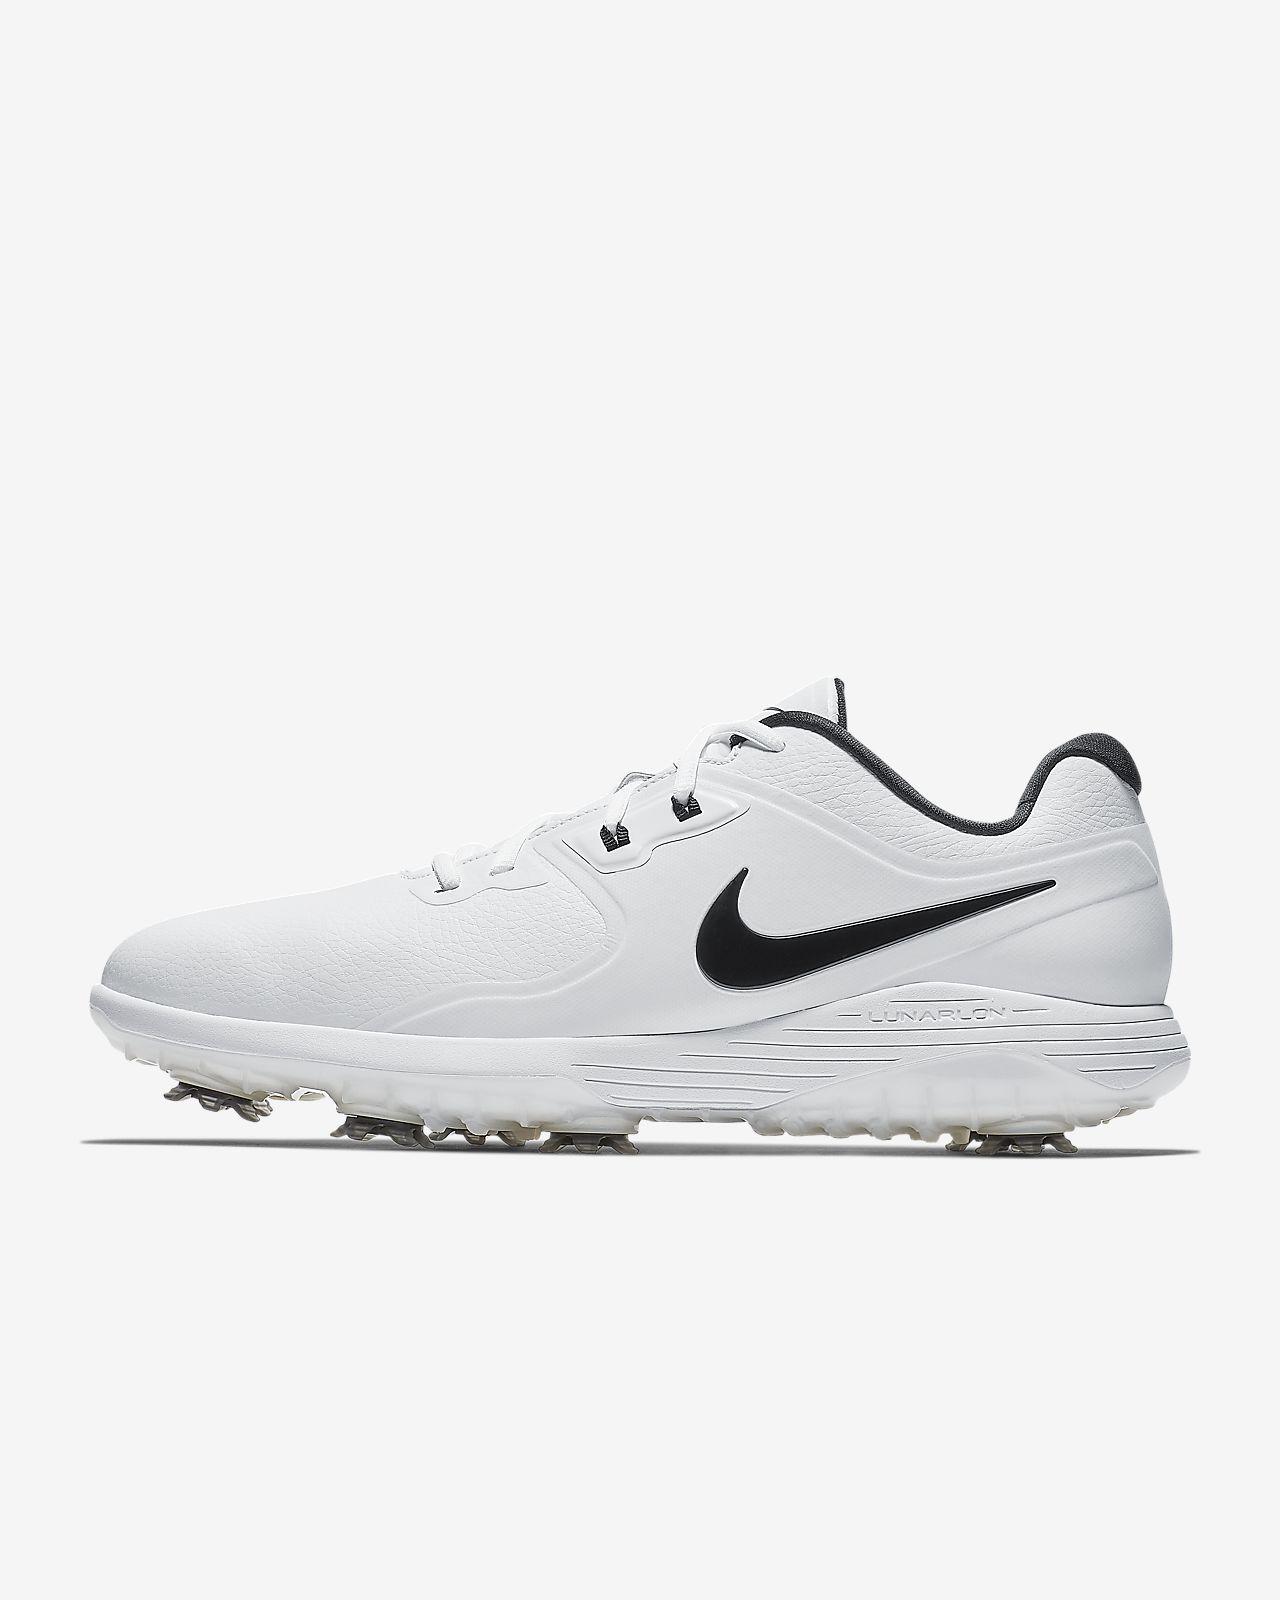 Scarpa da golf Nike Vapor Pro - Uomo